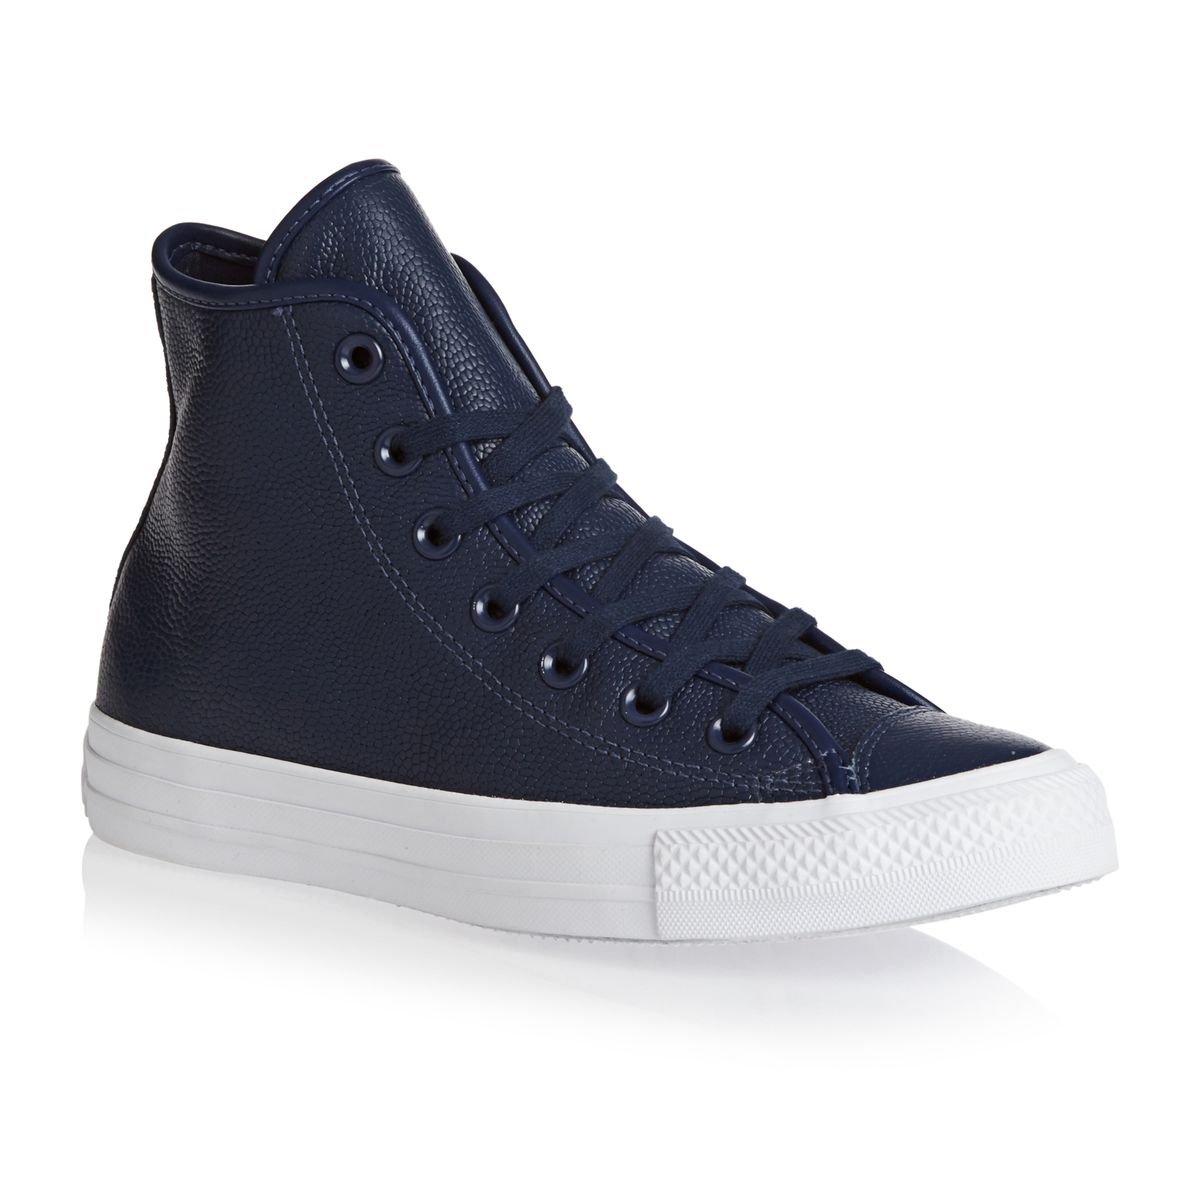 Converse Damen Sneaker Chuck Taylor All Star Star Star 157635C Blau 364943 Blau 1b63cf